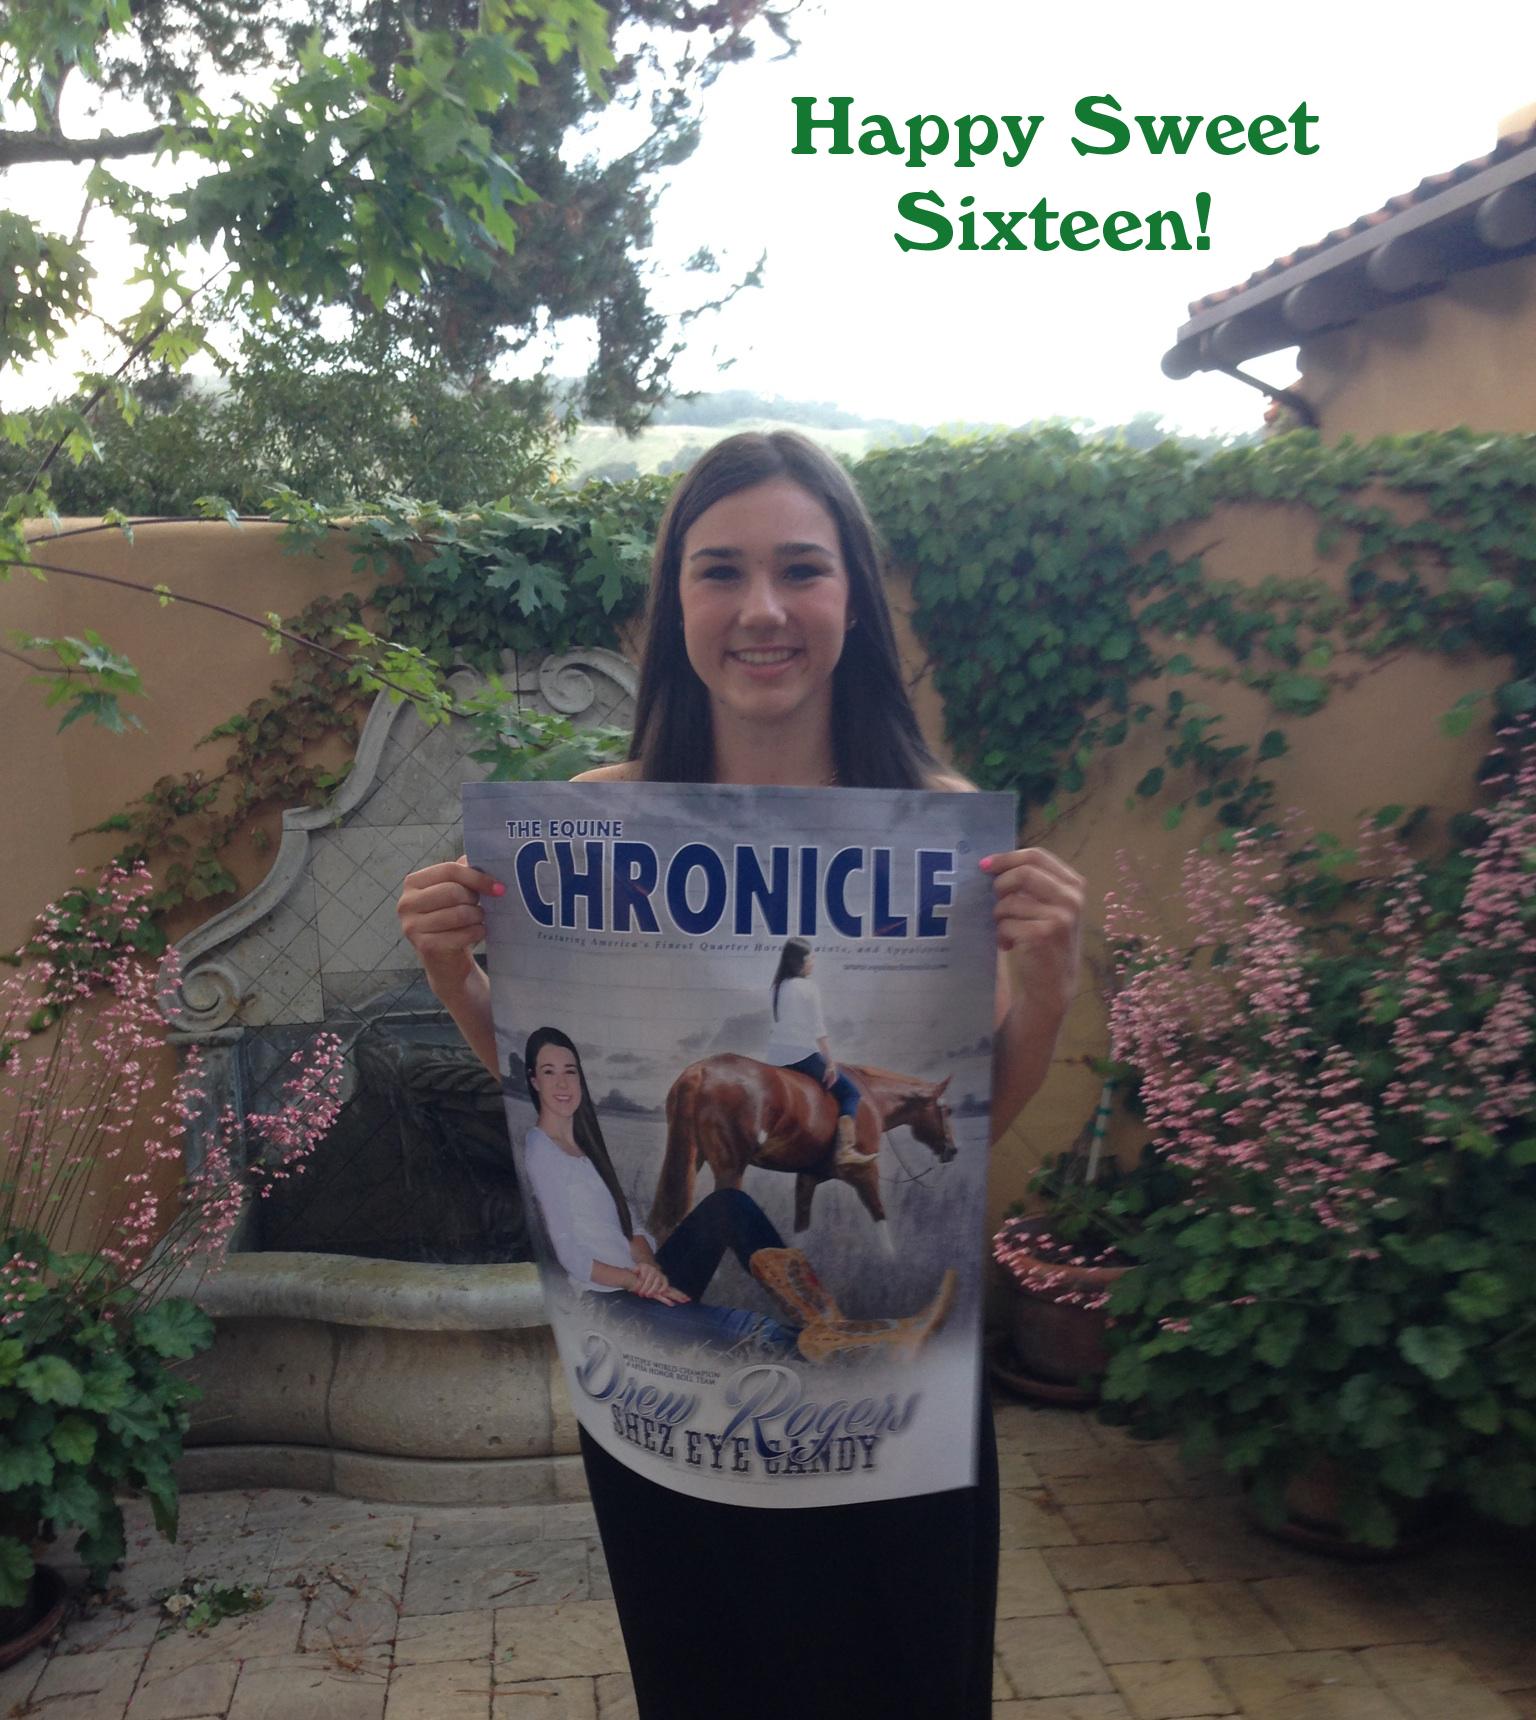 Happy Sweet Sixteen EC Cover Girl Drew Rogers!